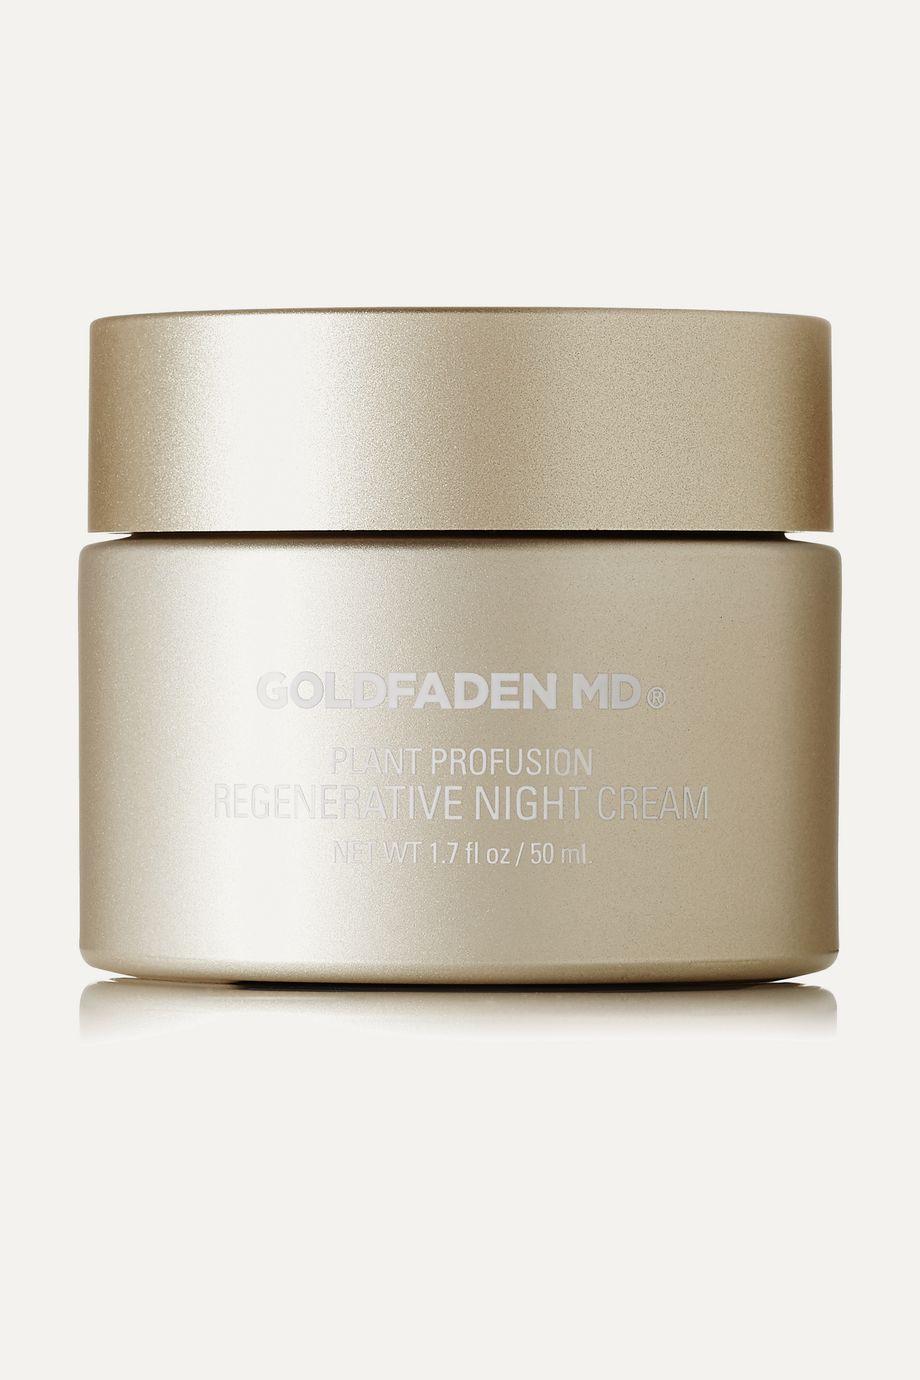 Goldfaden MD Plant Profusion Regenerative Night Cream, 50ml